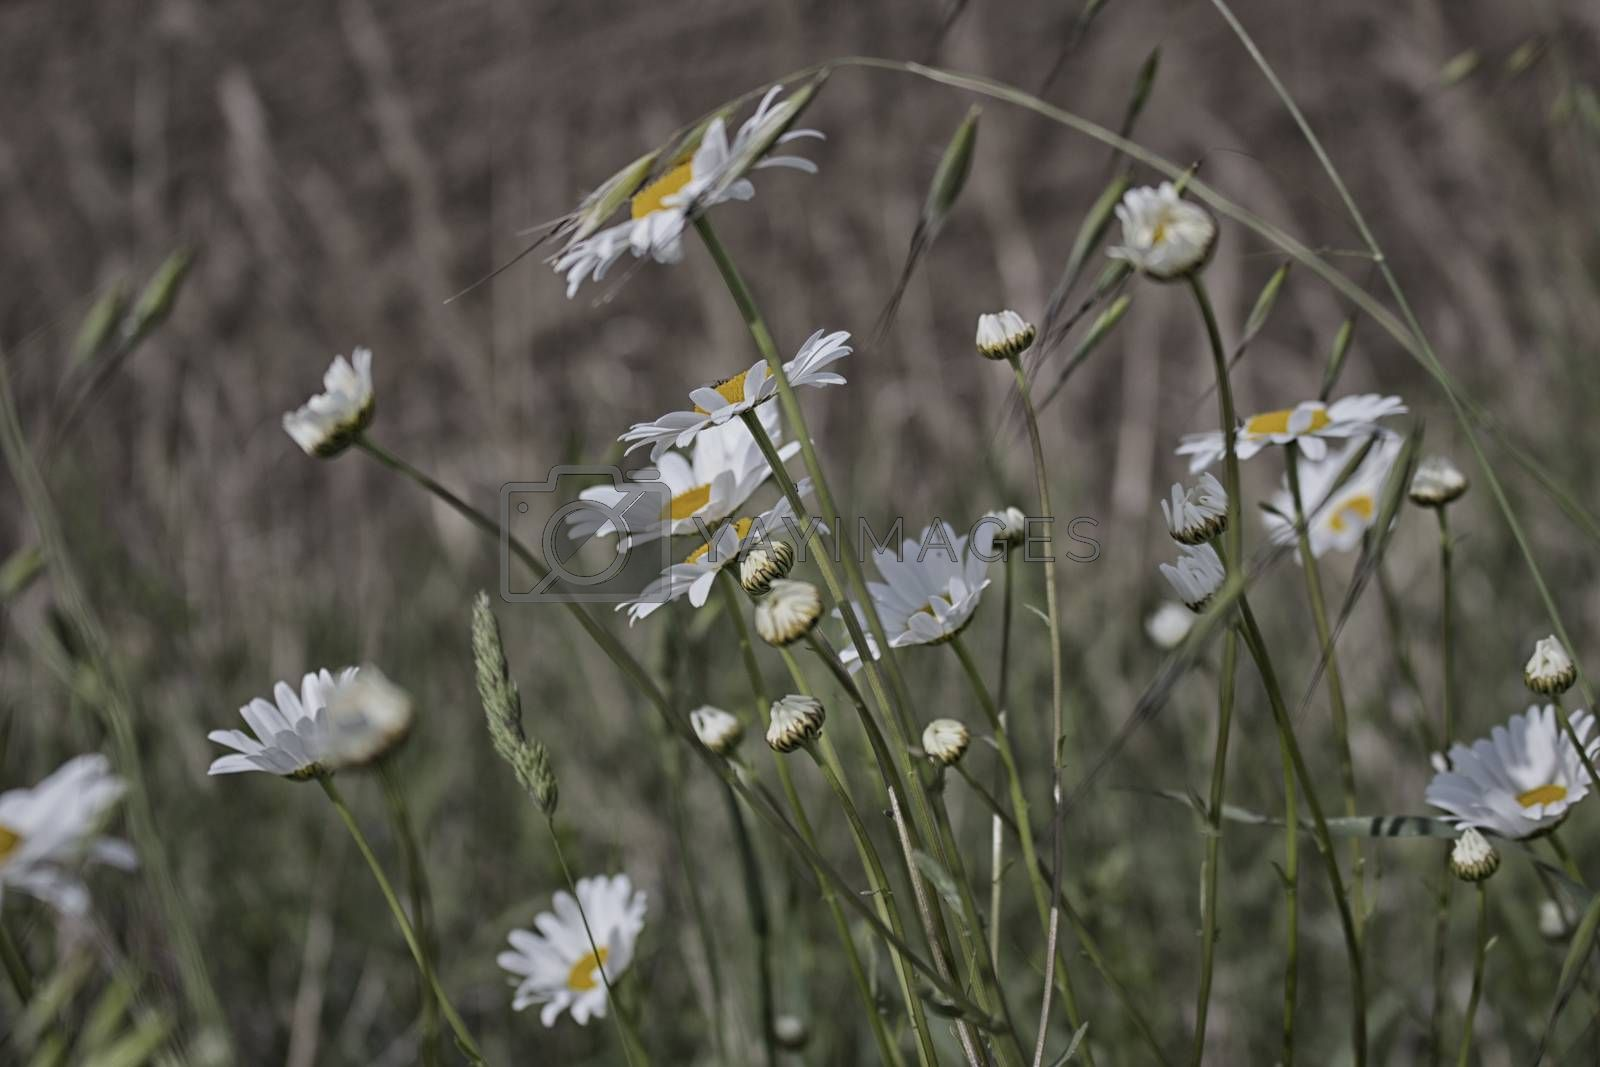 Daisies macro: bellis perennis